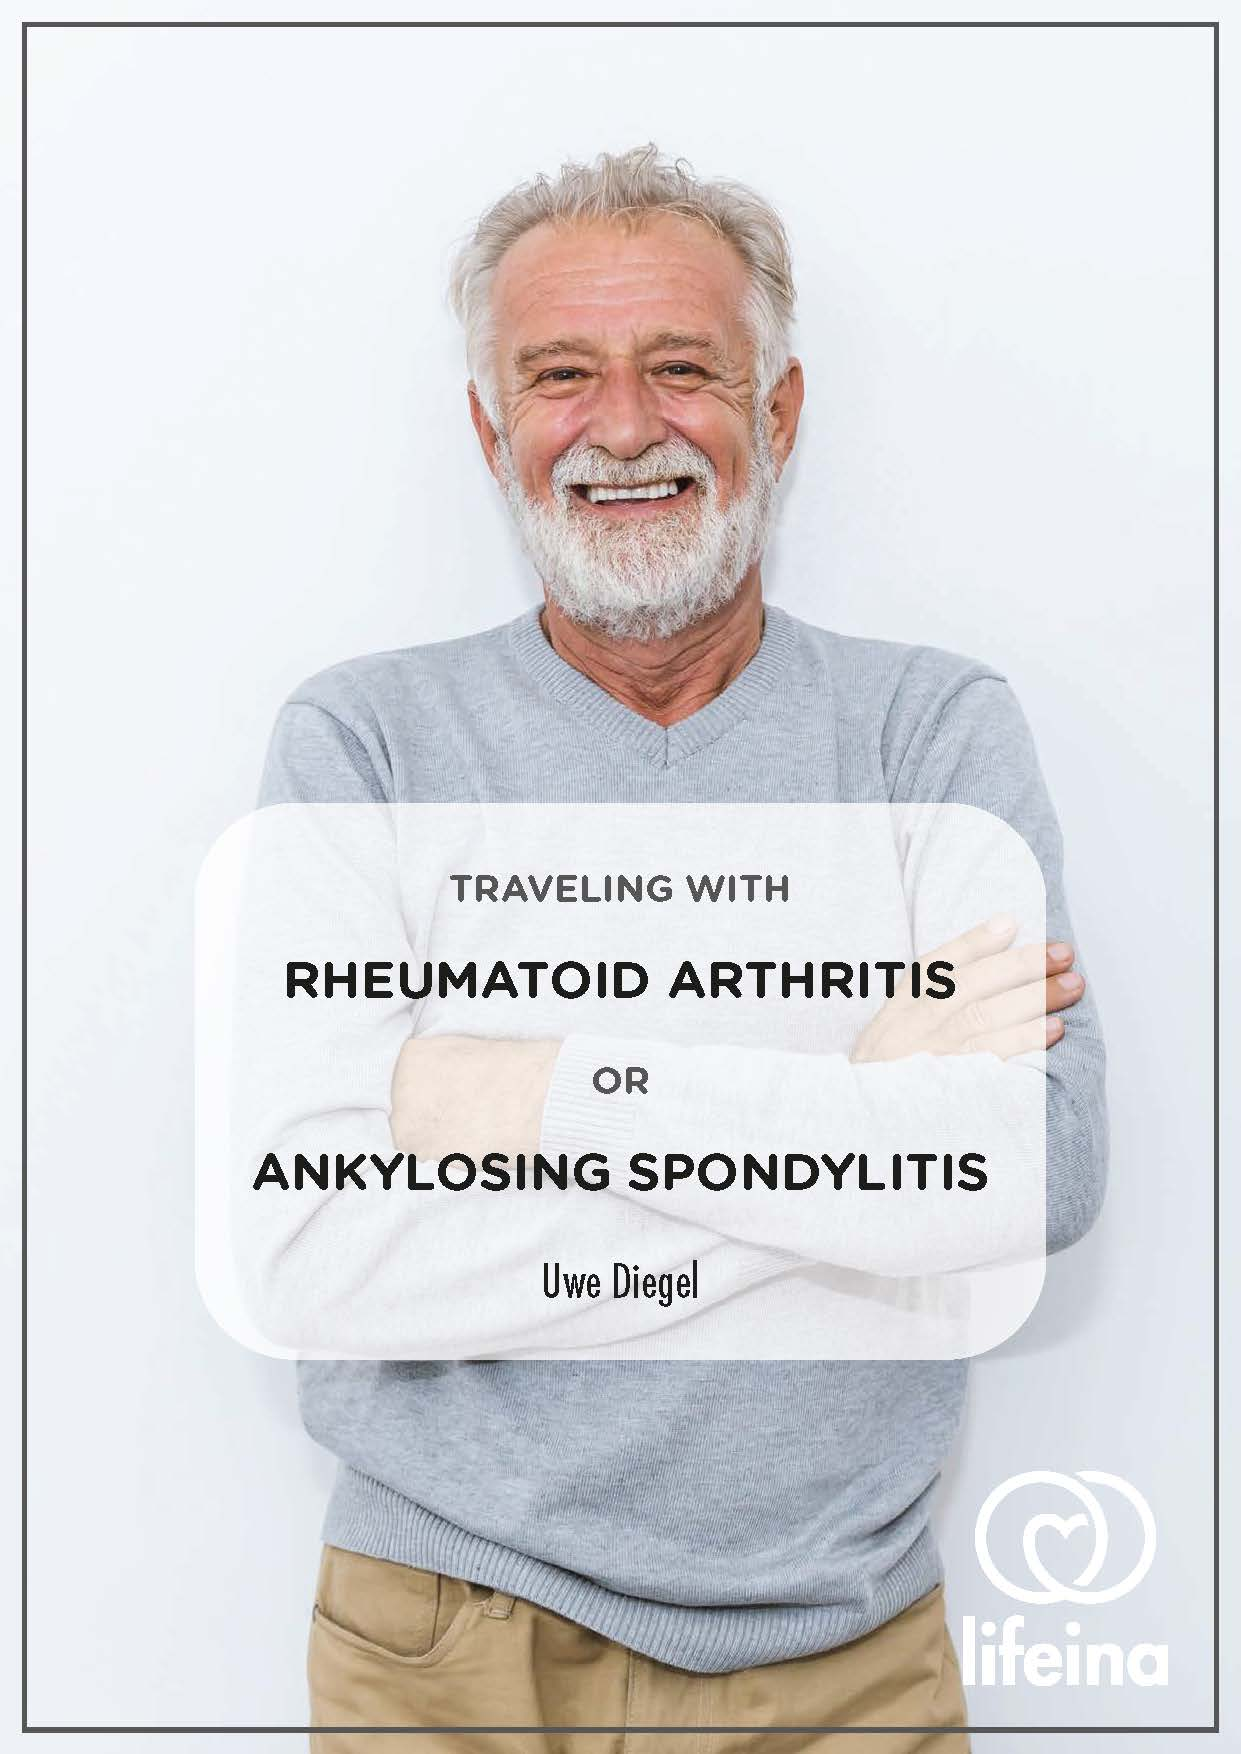 https://lifeina.com/img/cms/Arthritis_EN.pdf